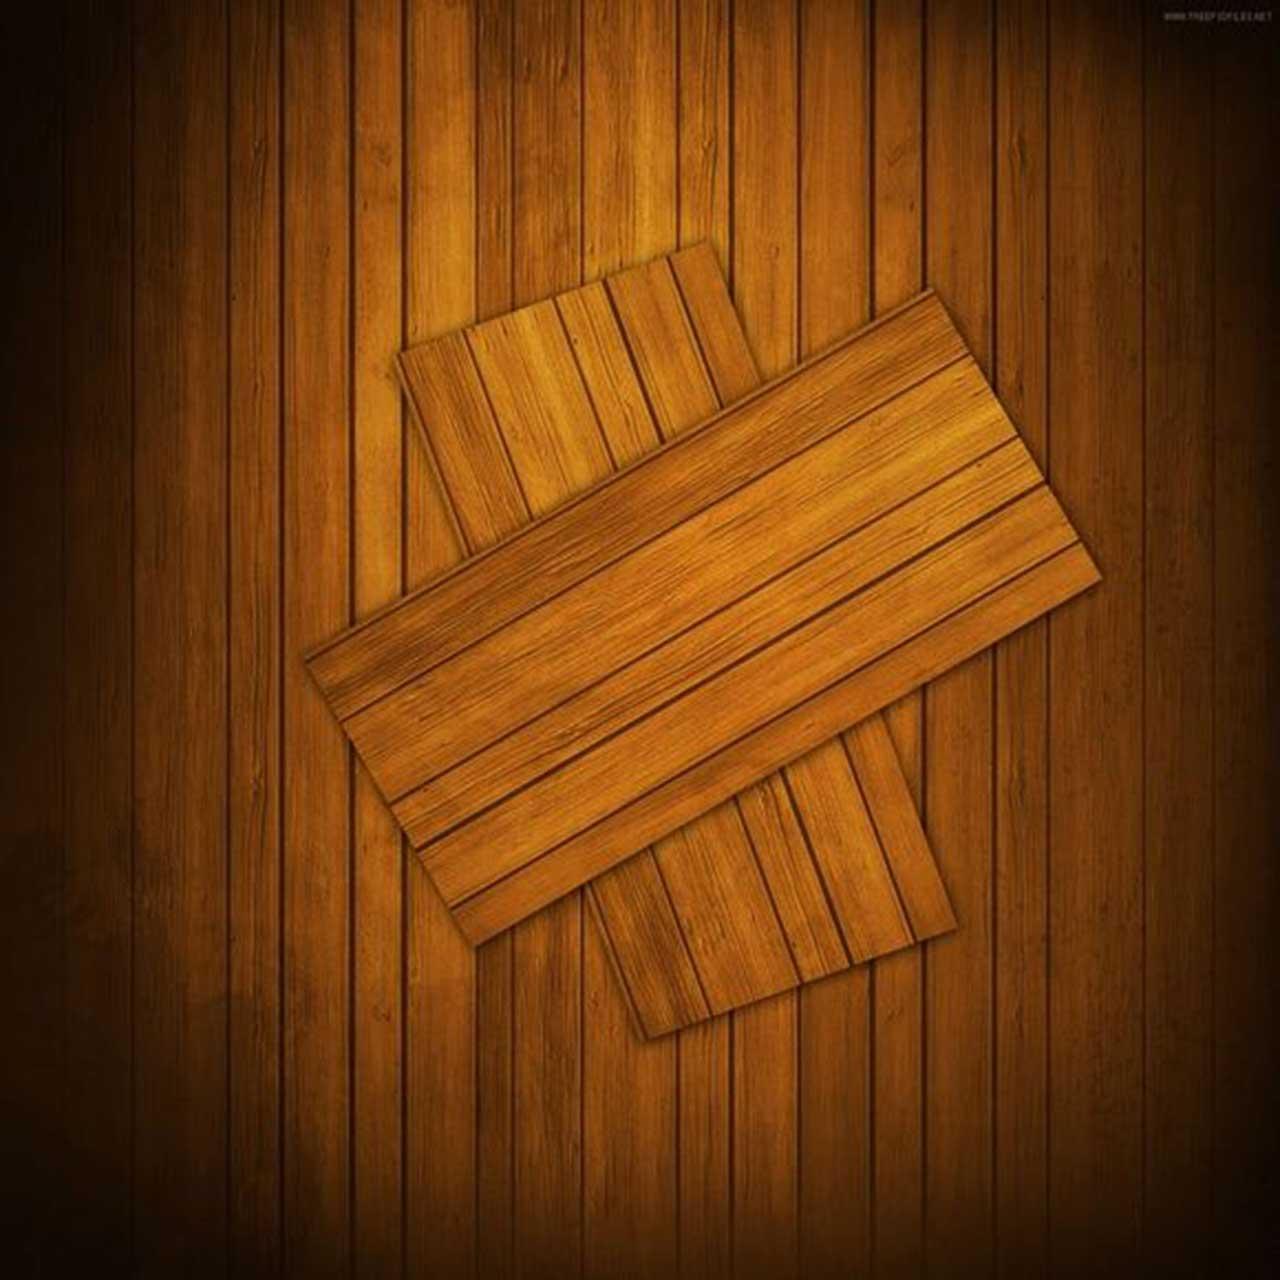 wallpaper ipad wood